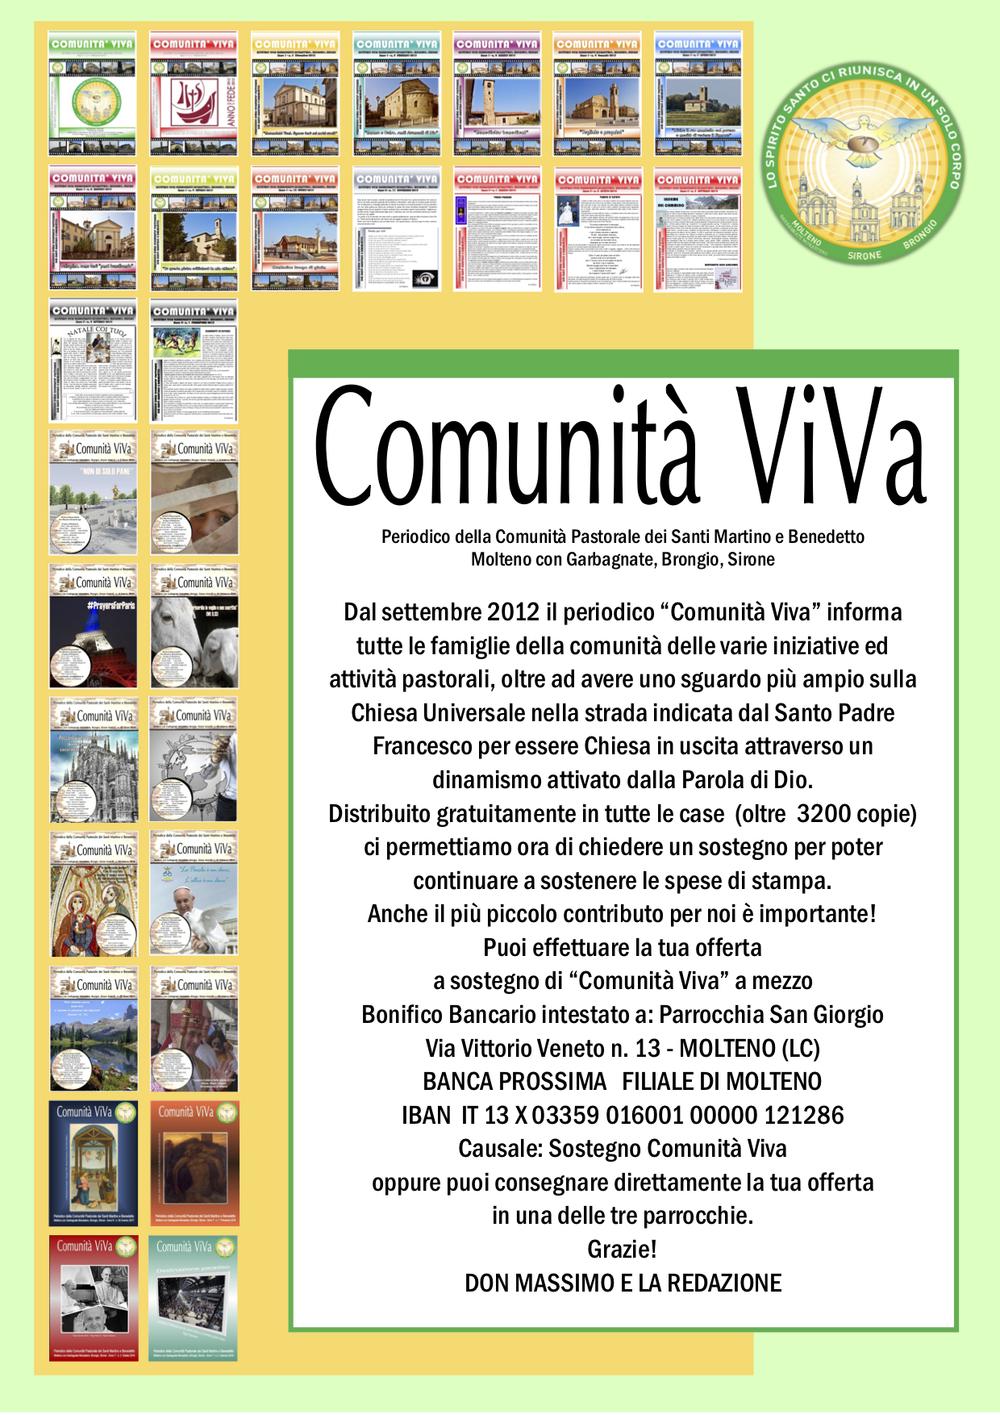 comunita-viva.png